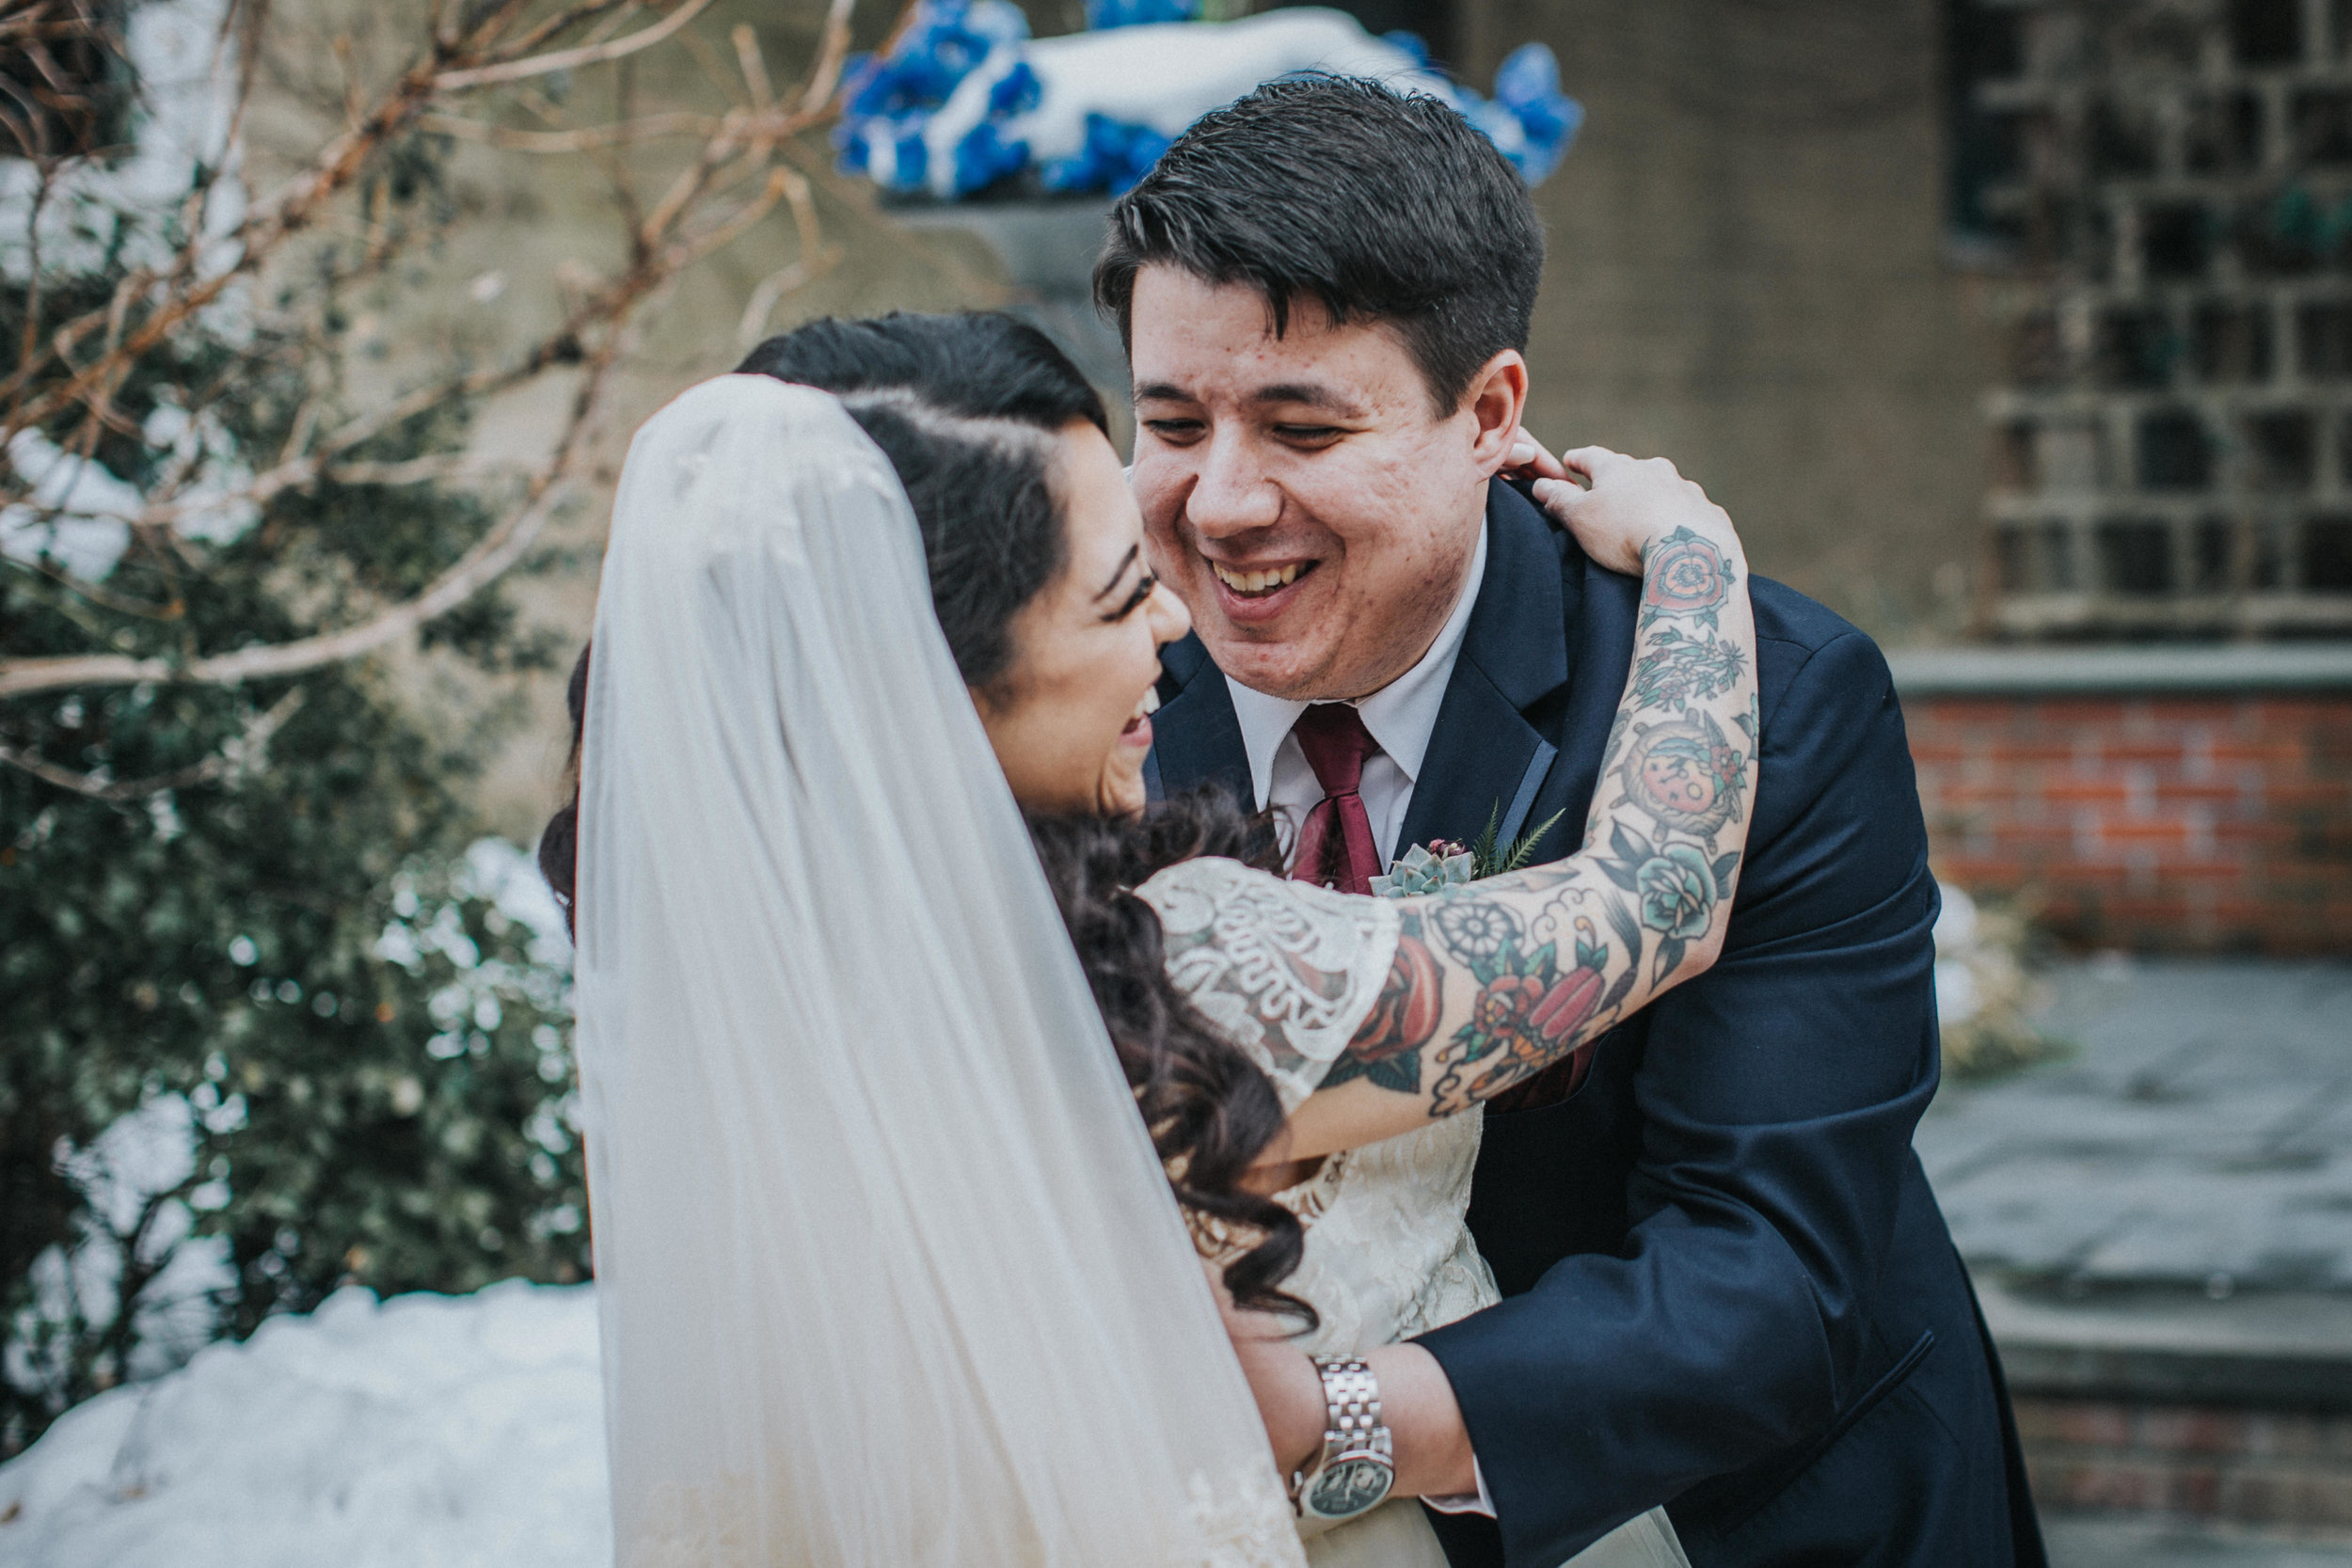 New-Jersey-Wedding-Photographer-ReceptionCenter-Valeria&Mike-First-Look-Bride&Groom (41 of 69).jpg